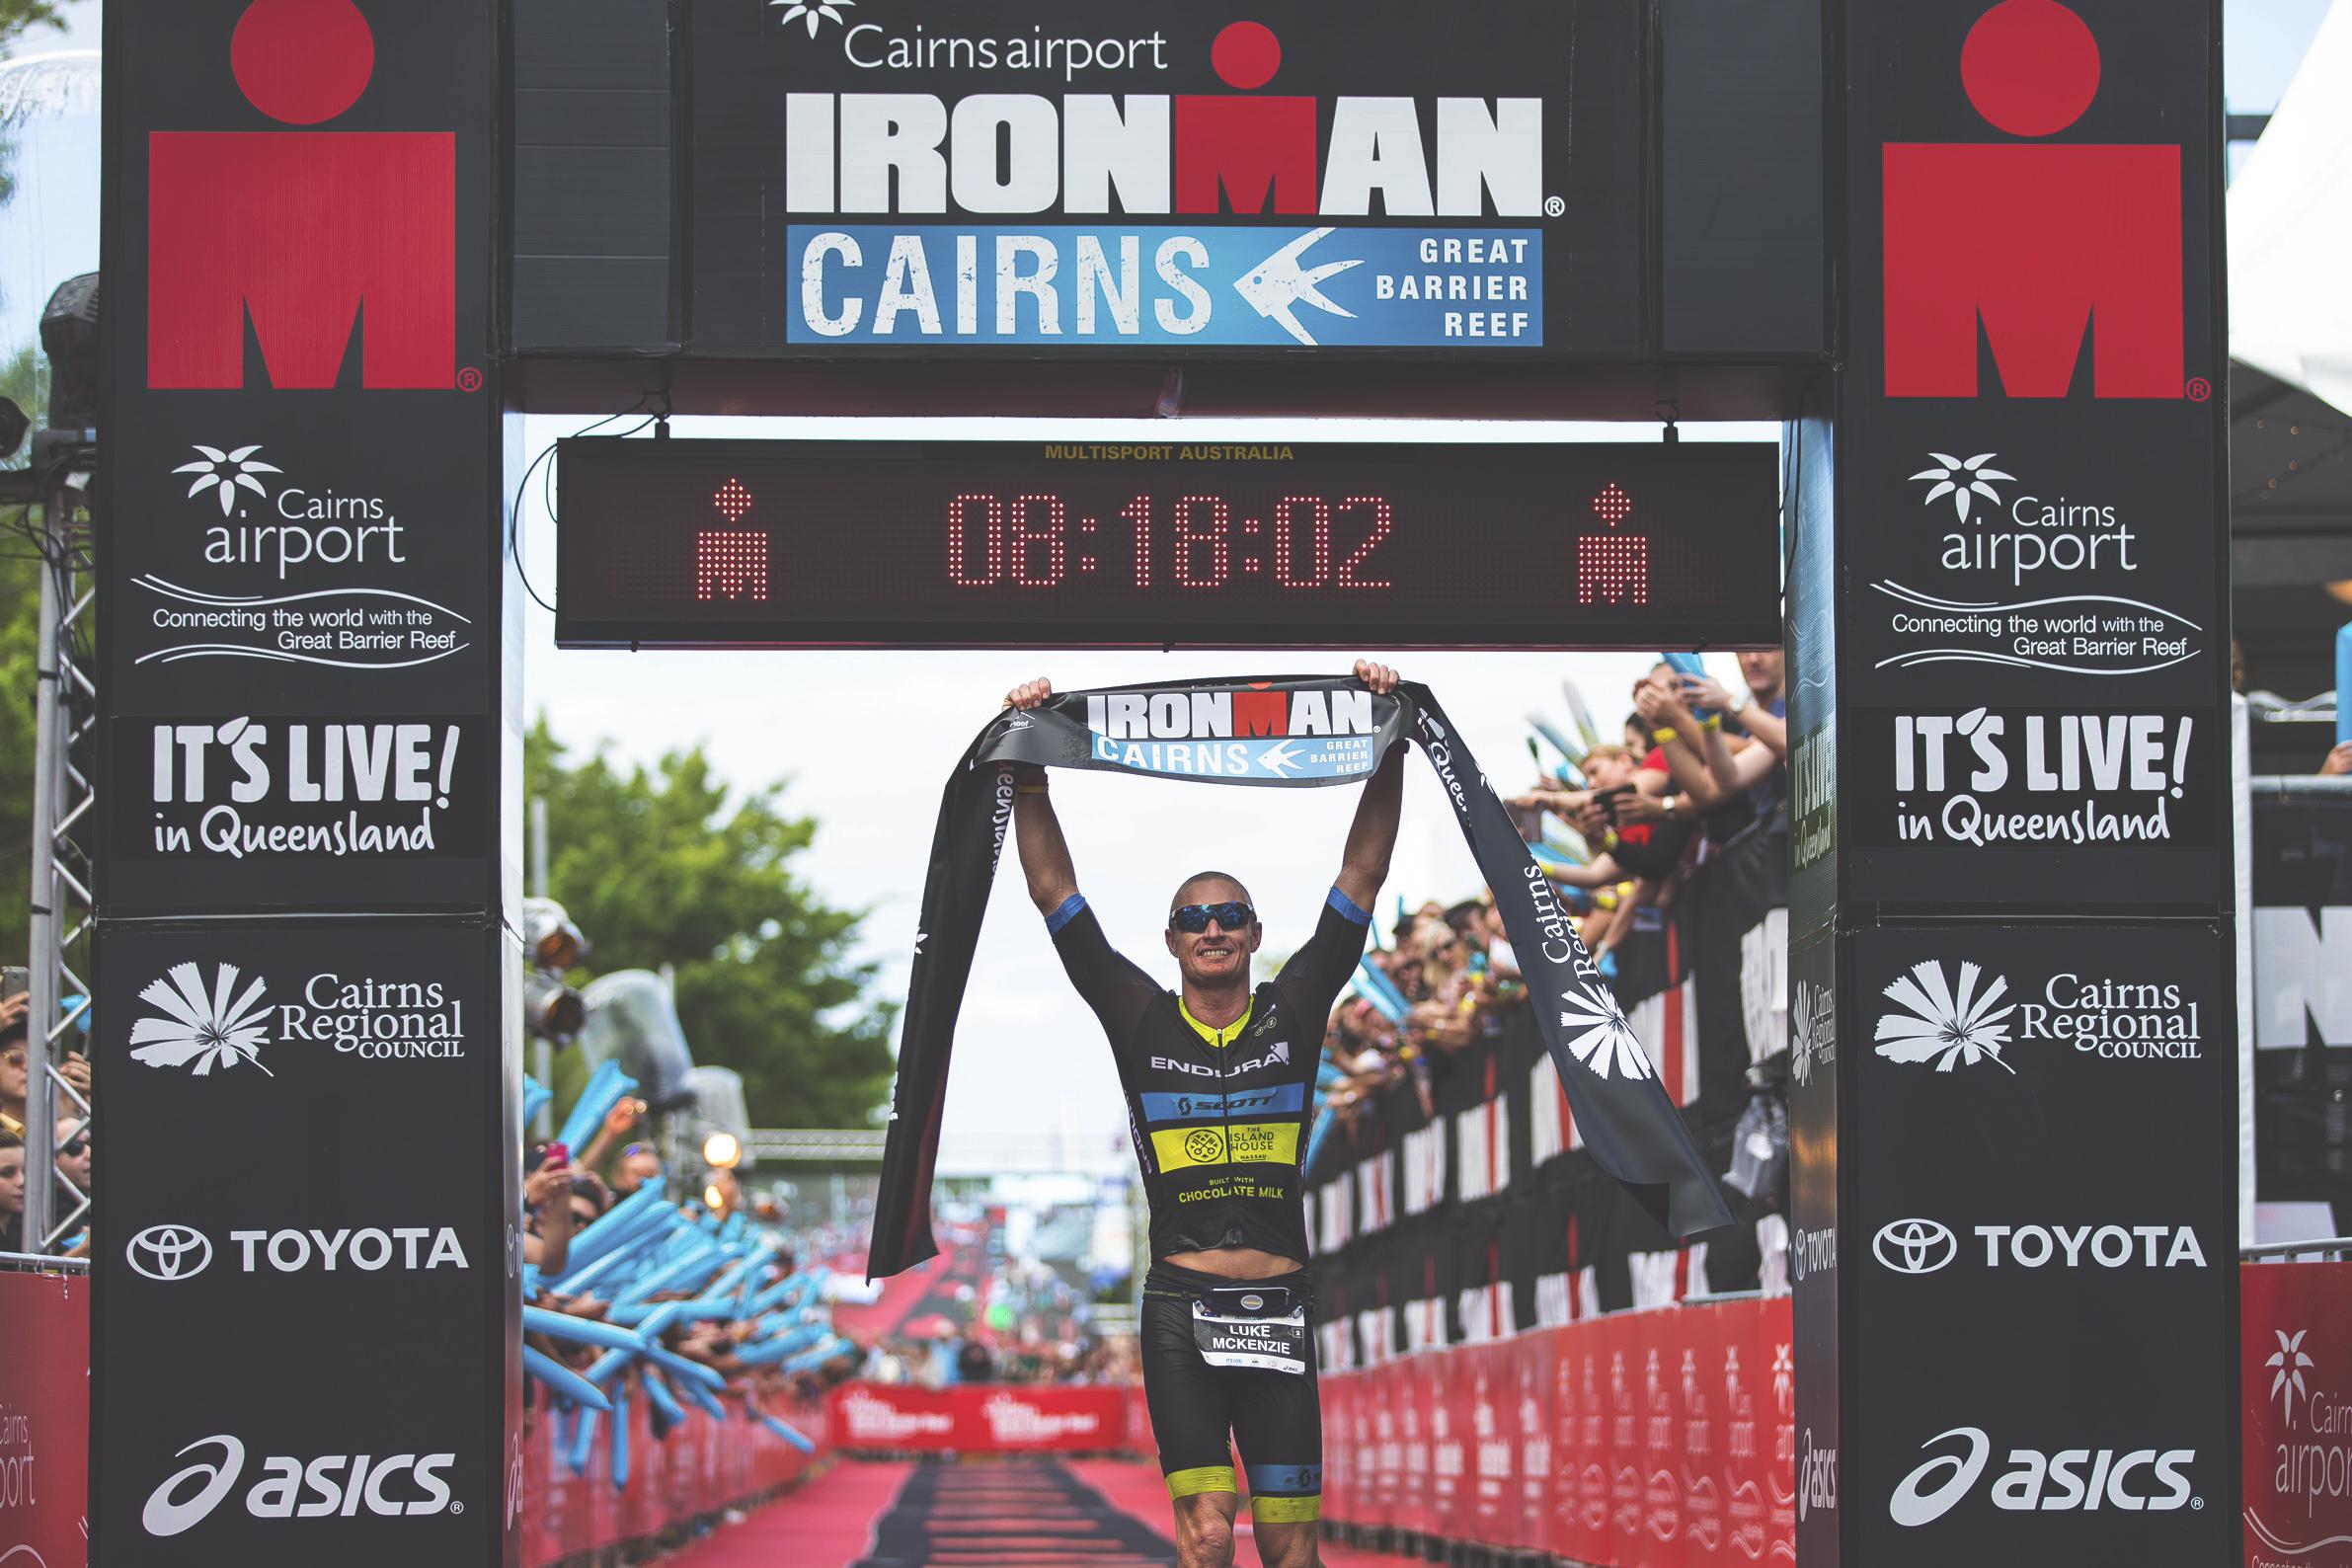 Luke McKenzieProfessional triathlete AND 8x ironman champion -